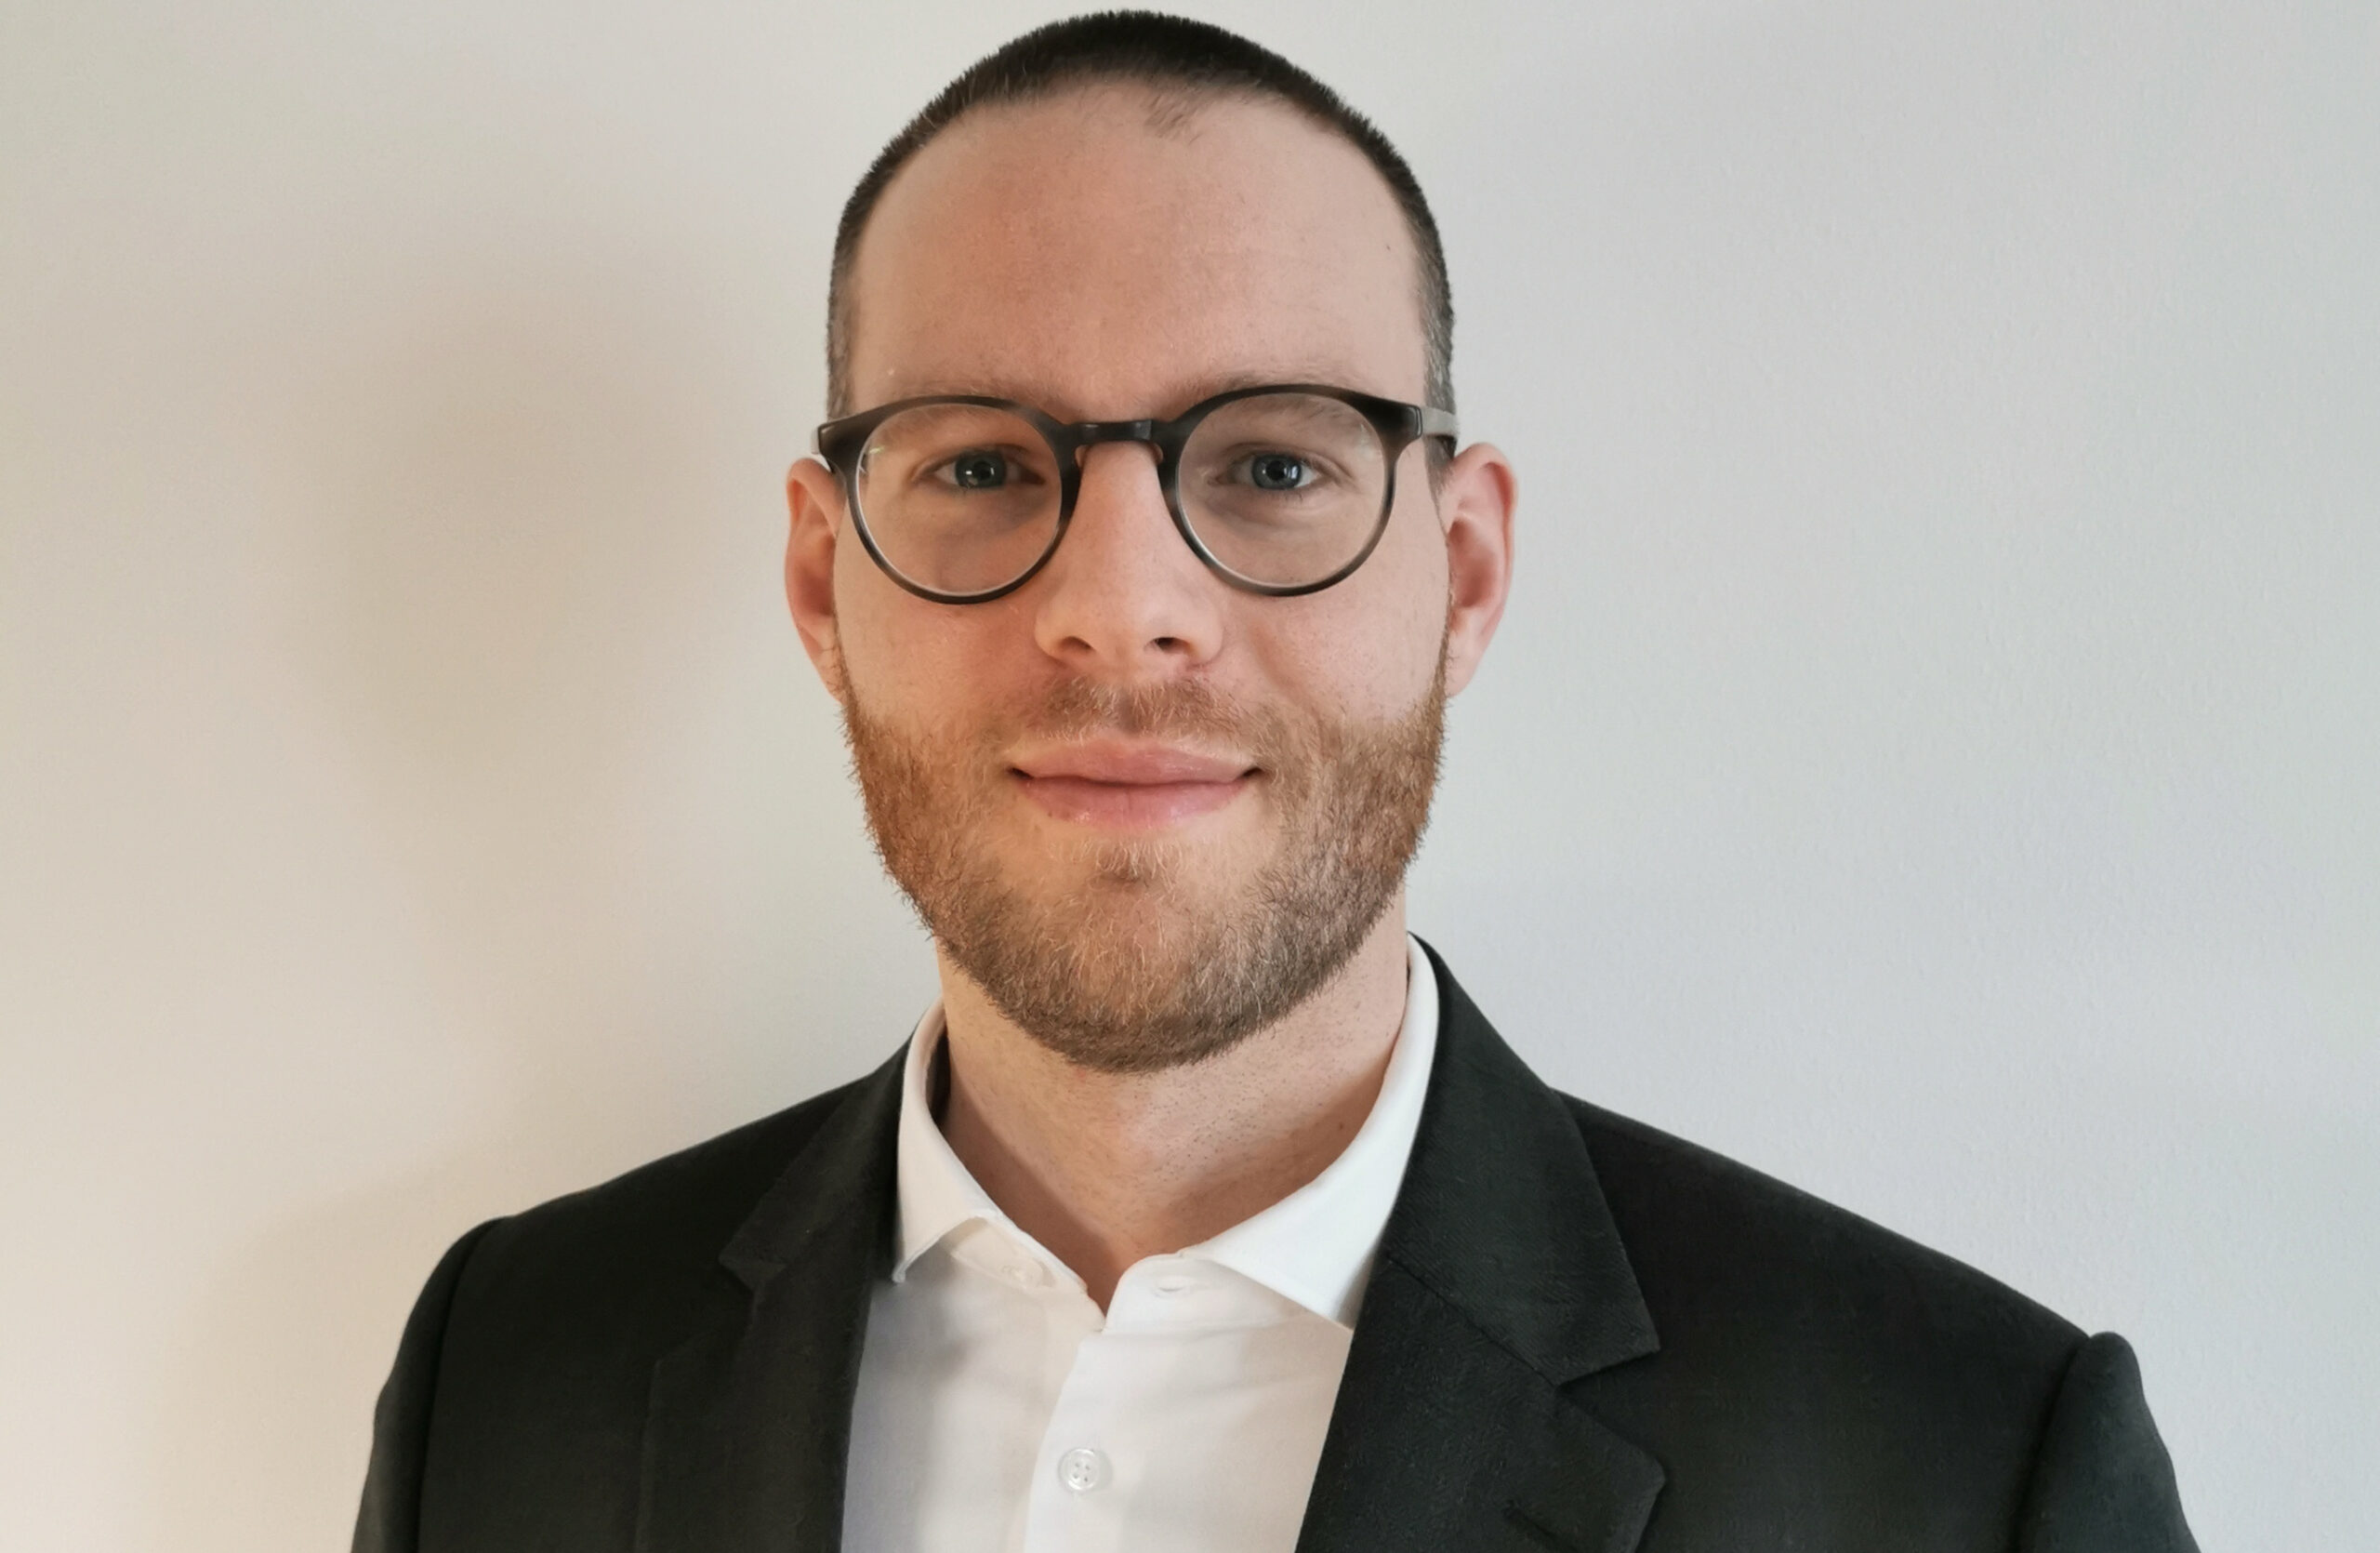 Gesichter Christian Pascal Meiske